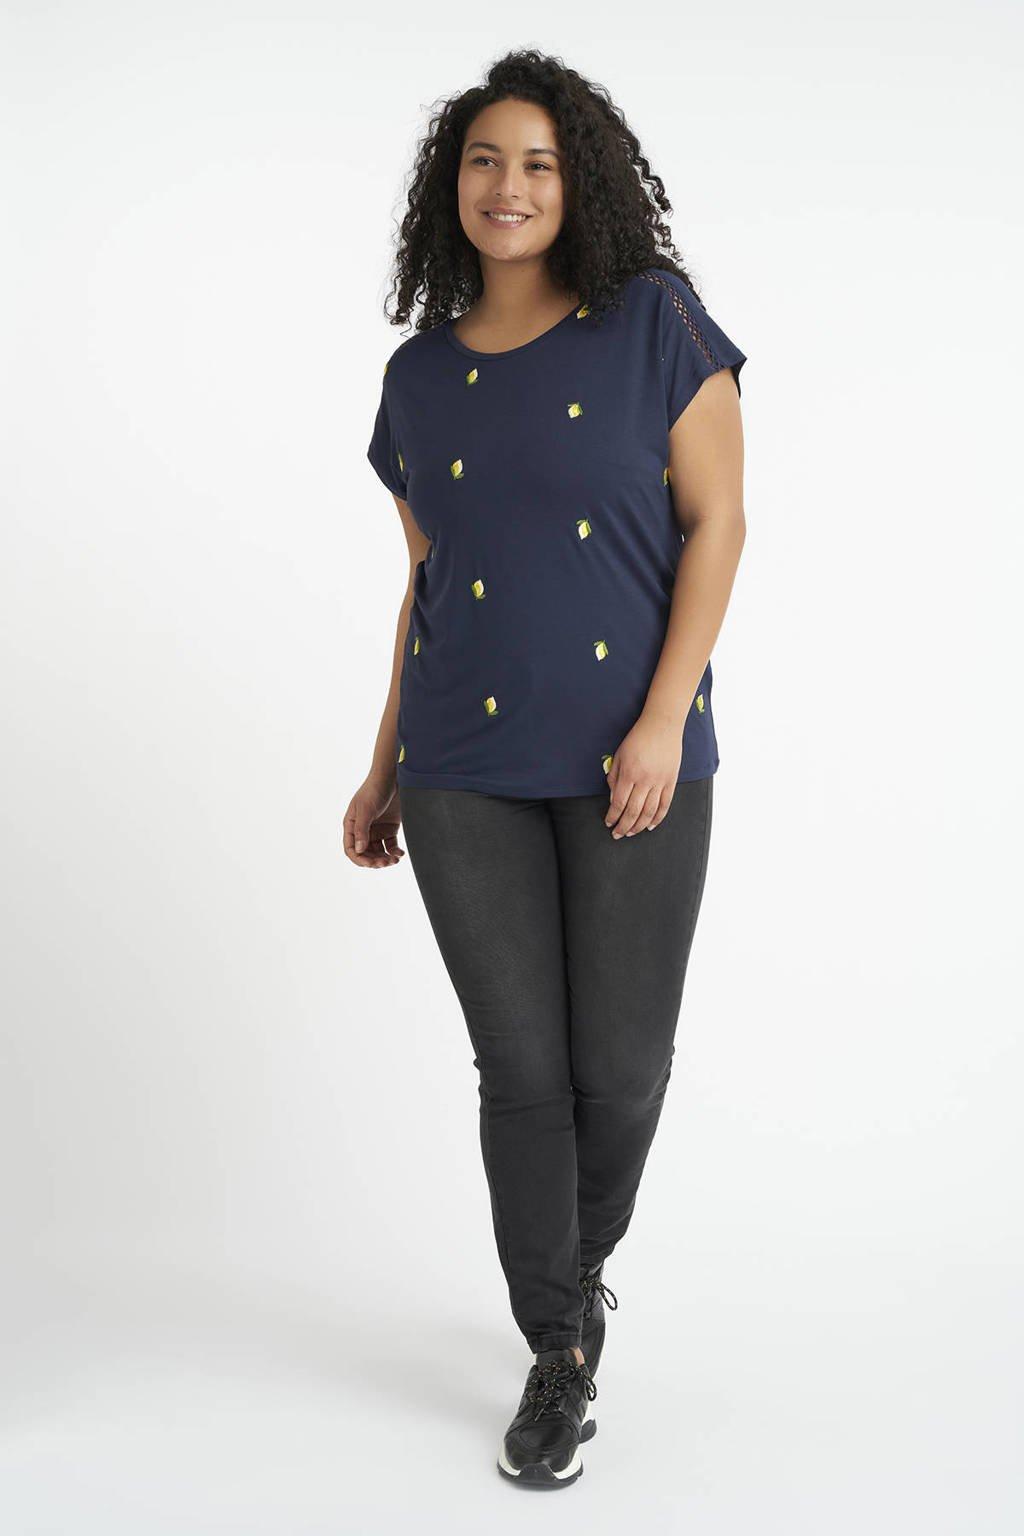 MS Mode T-shirt met fruitprint en borduursels donkerblauw/geel/groen, Donkerblauw/geel/groen